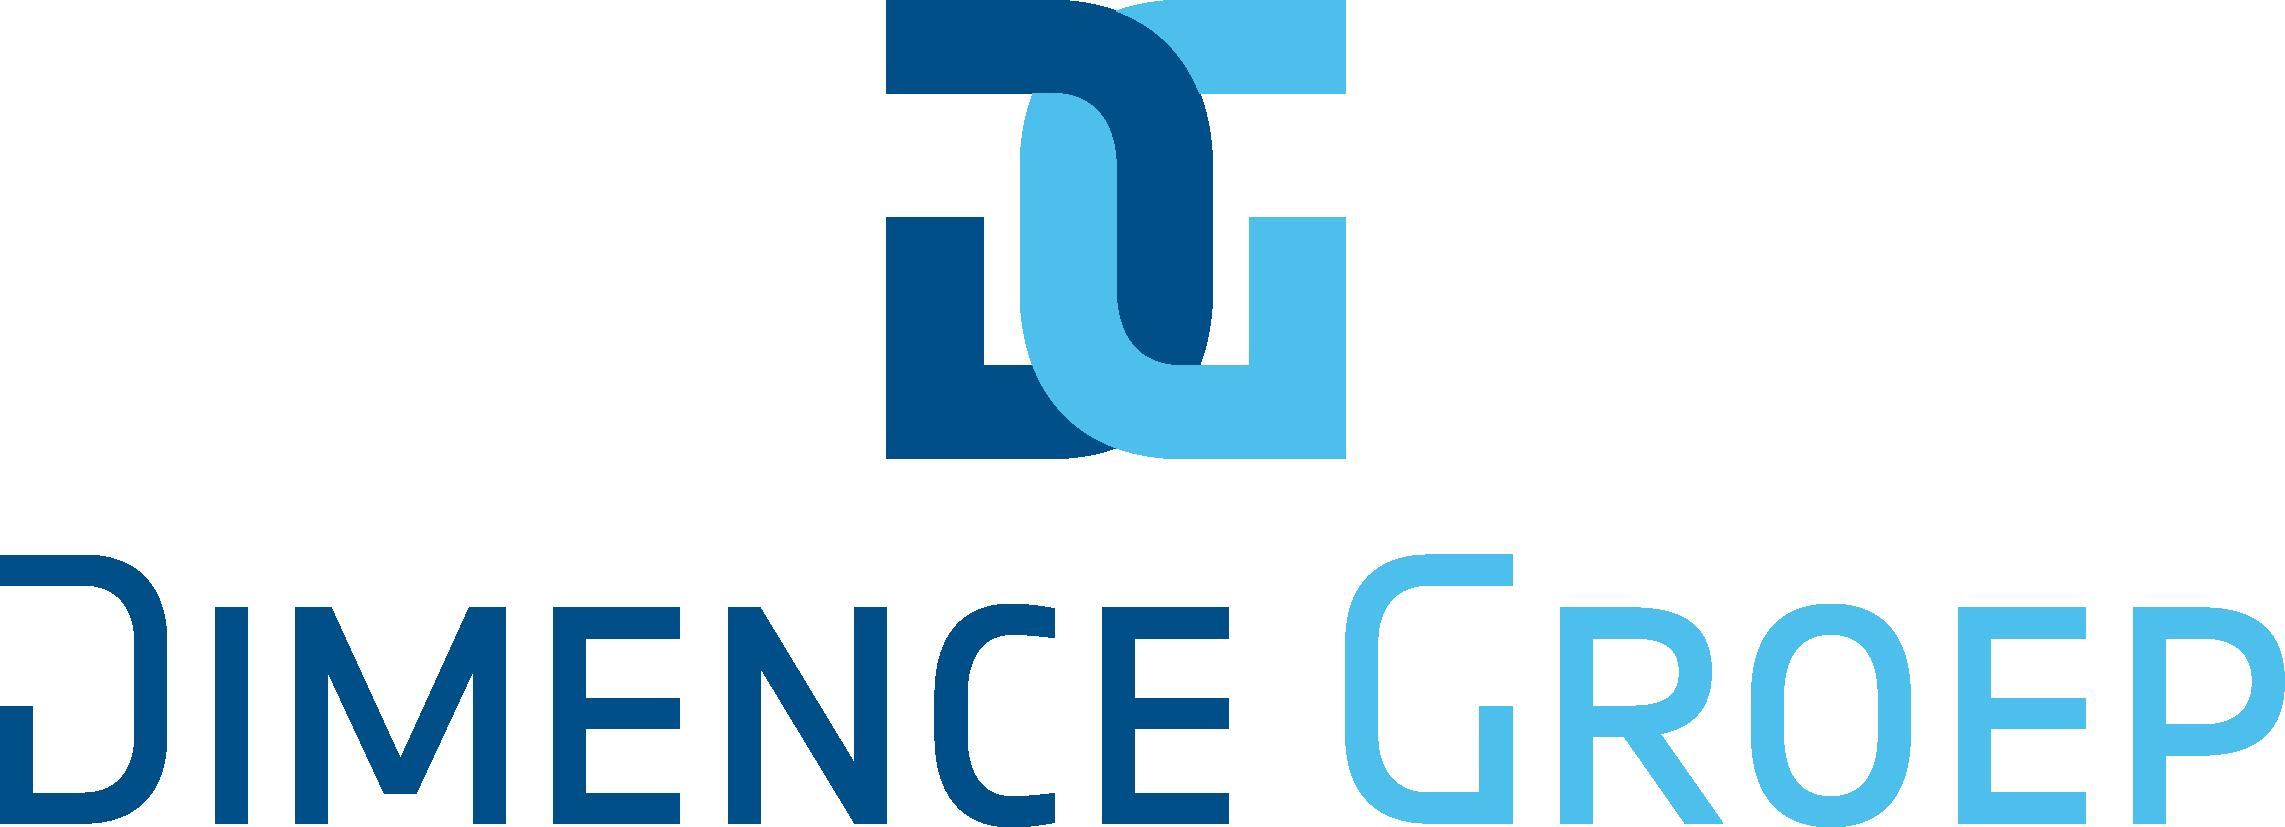 DimenceGroep_logo